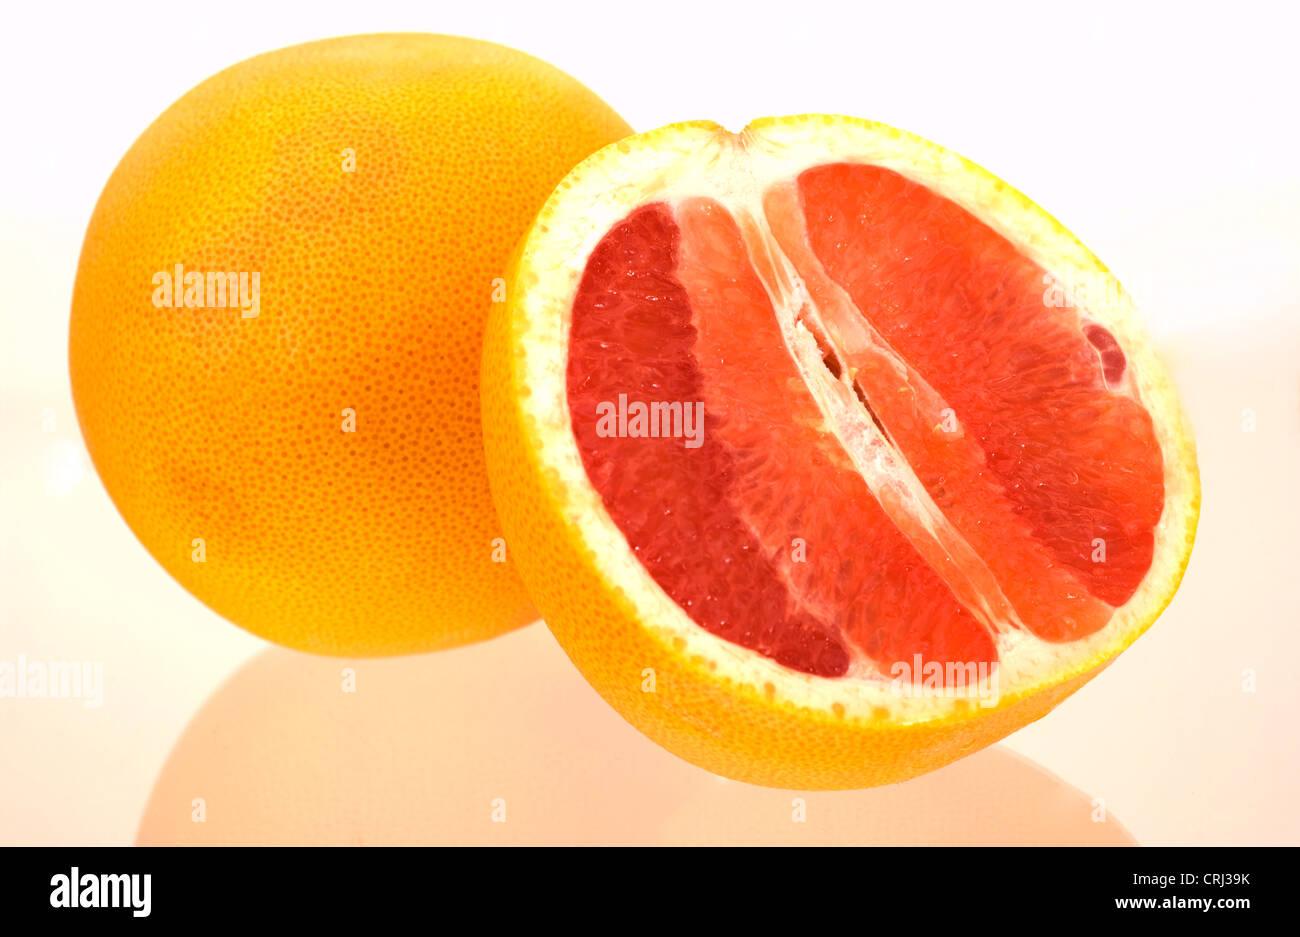 Antioxidant Lycopene Citrus Citrus Paradisi Food Foodstuff Fruit Grapefruit Half Halves Healthy Healthy Diet Low - Stock Image